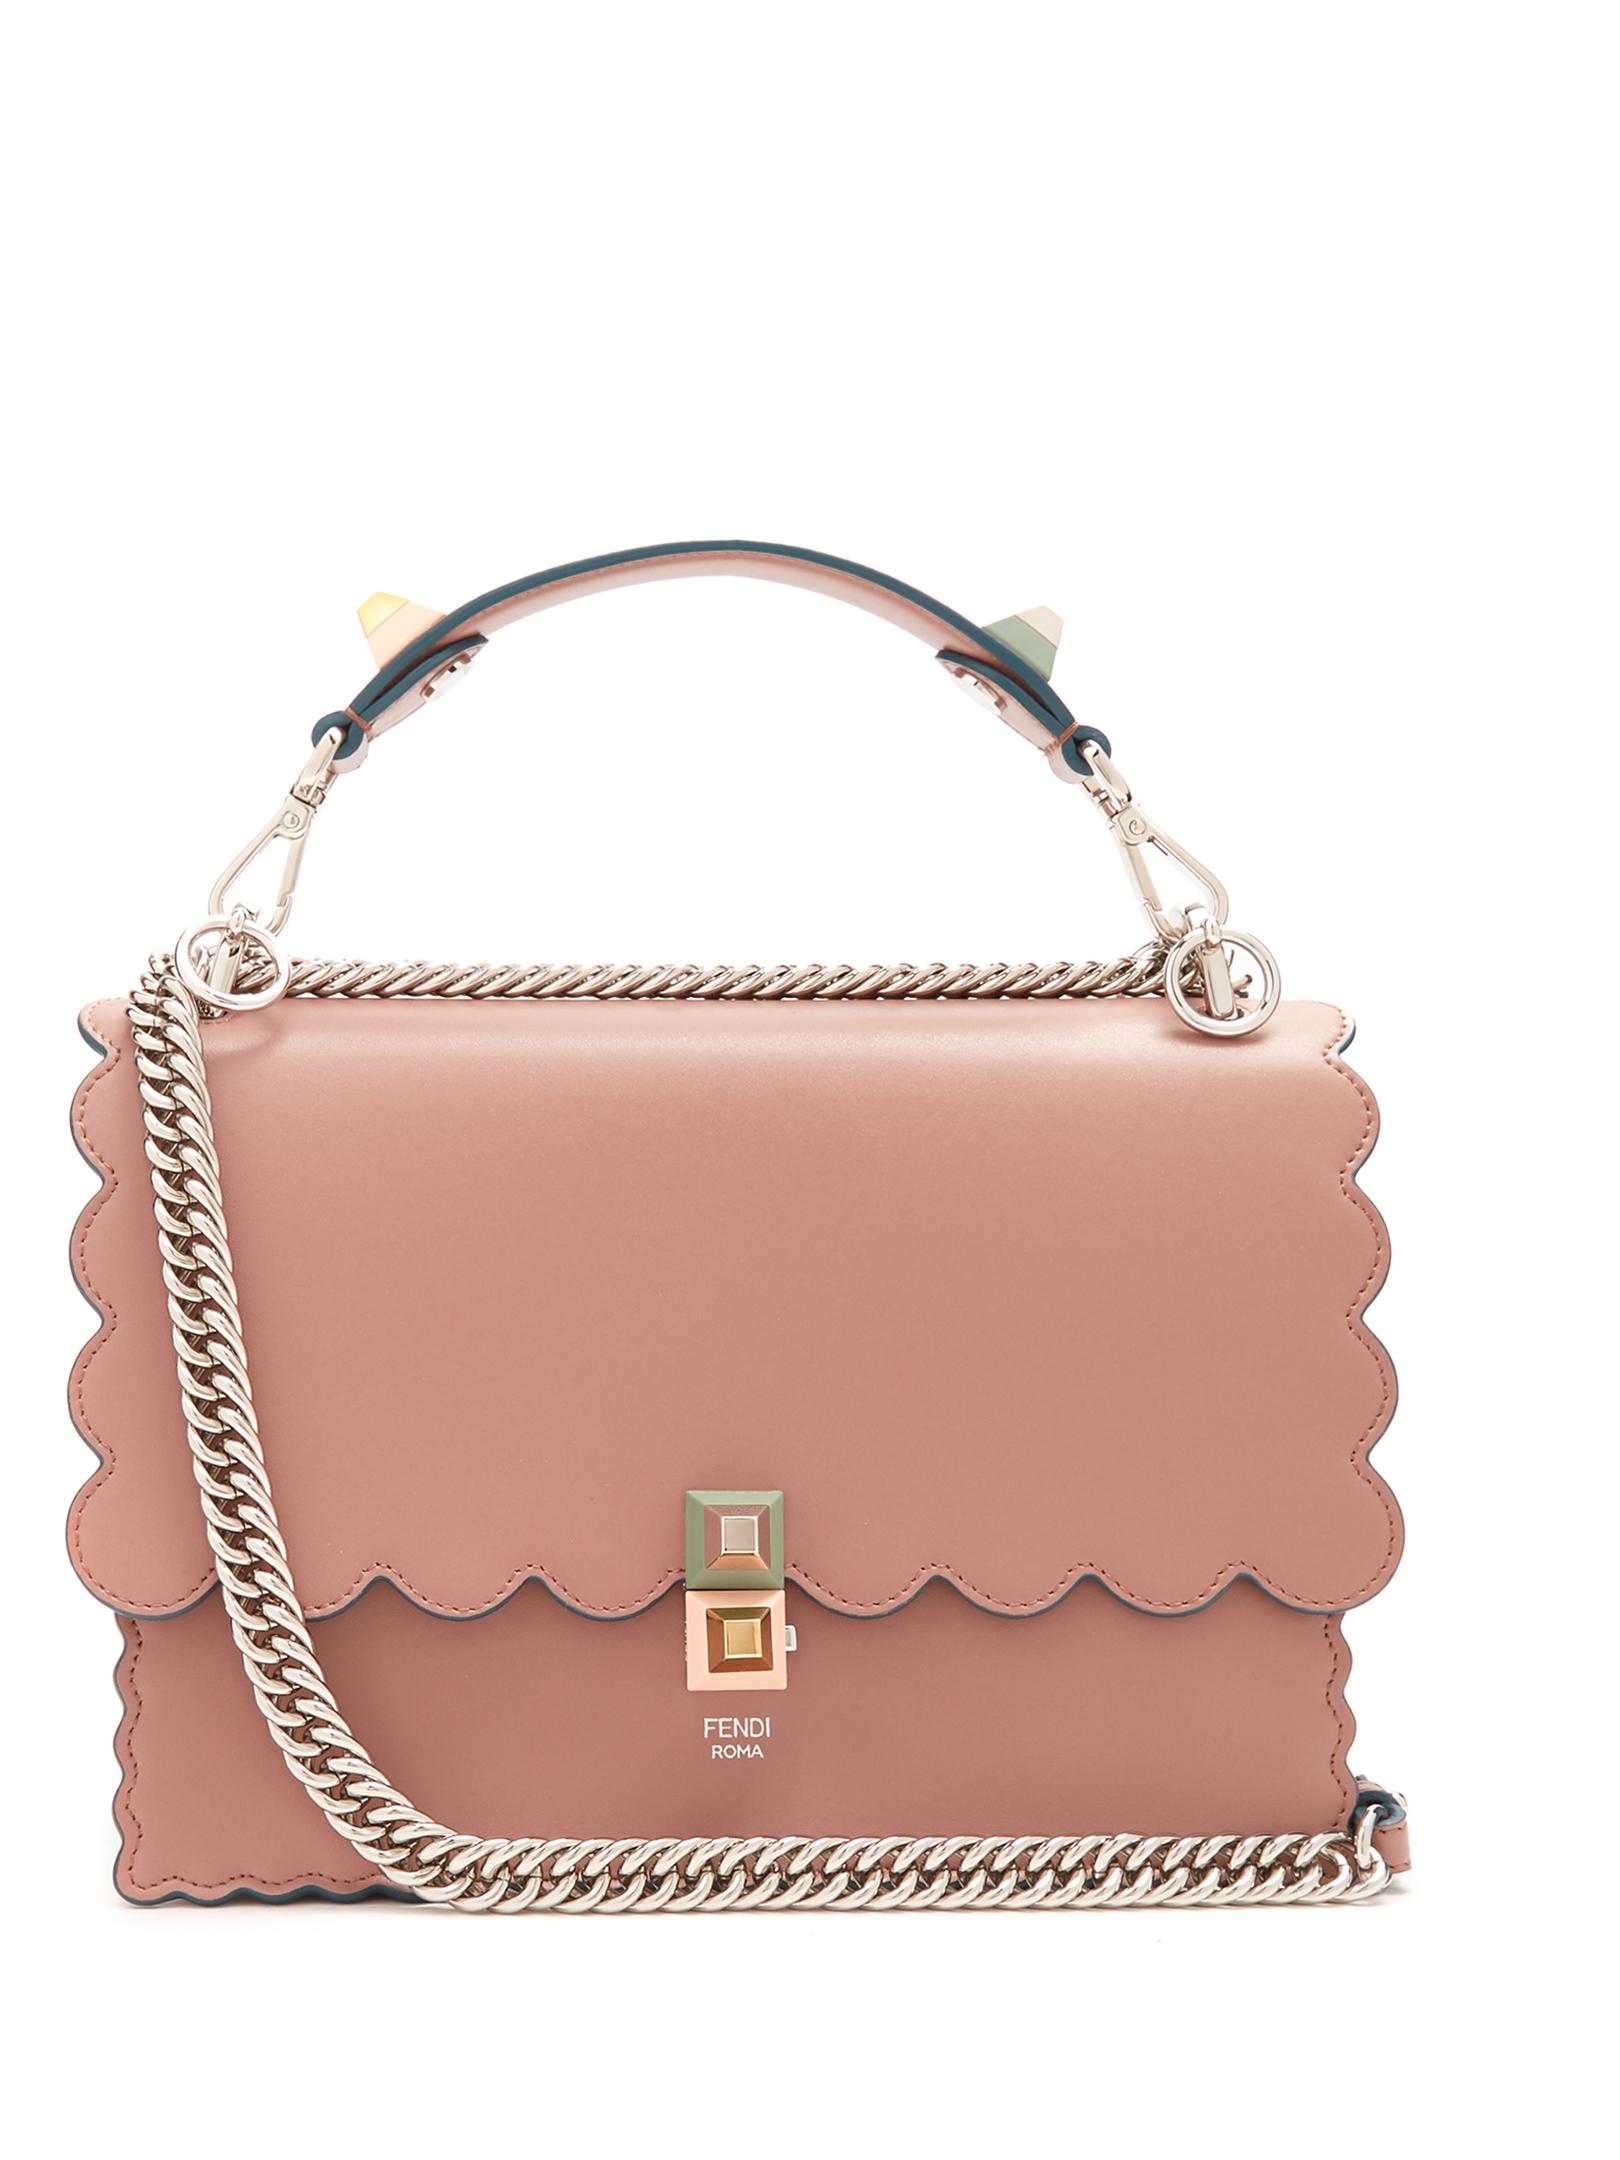 Fendi Kan I Leather Shoulder Bag Fashion Style Fan